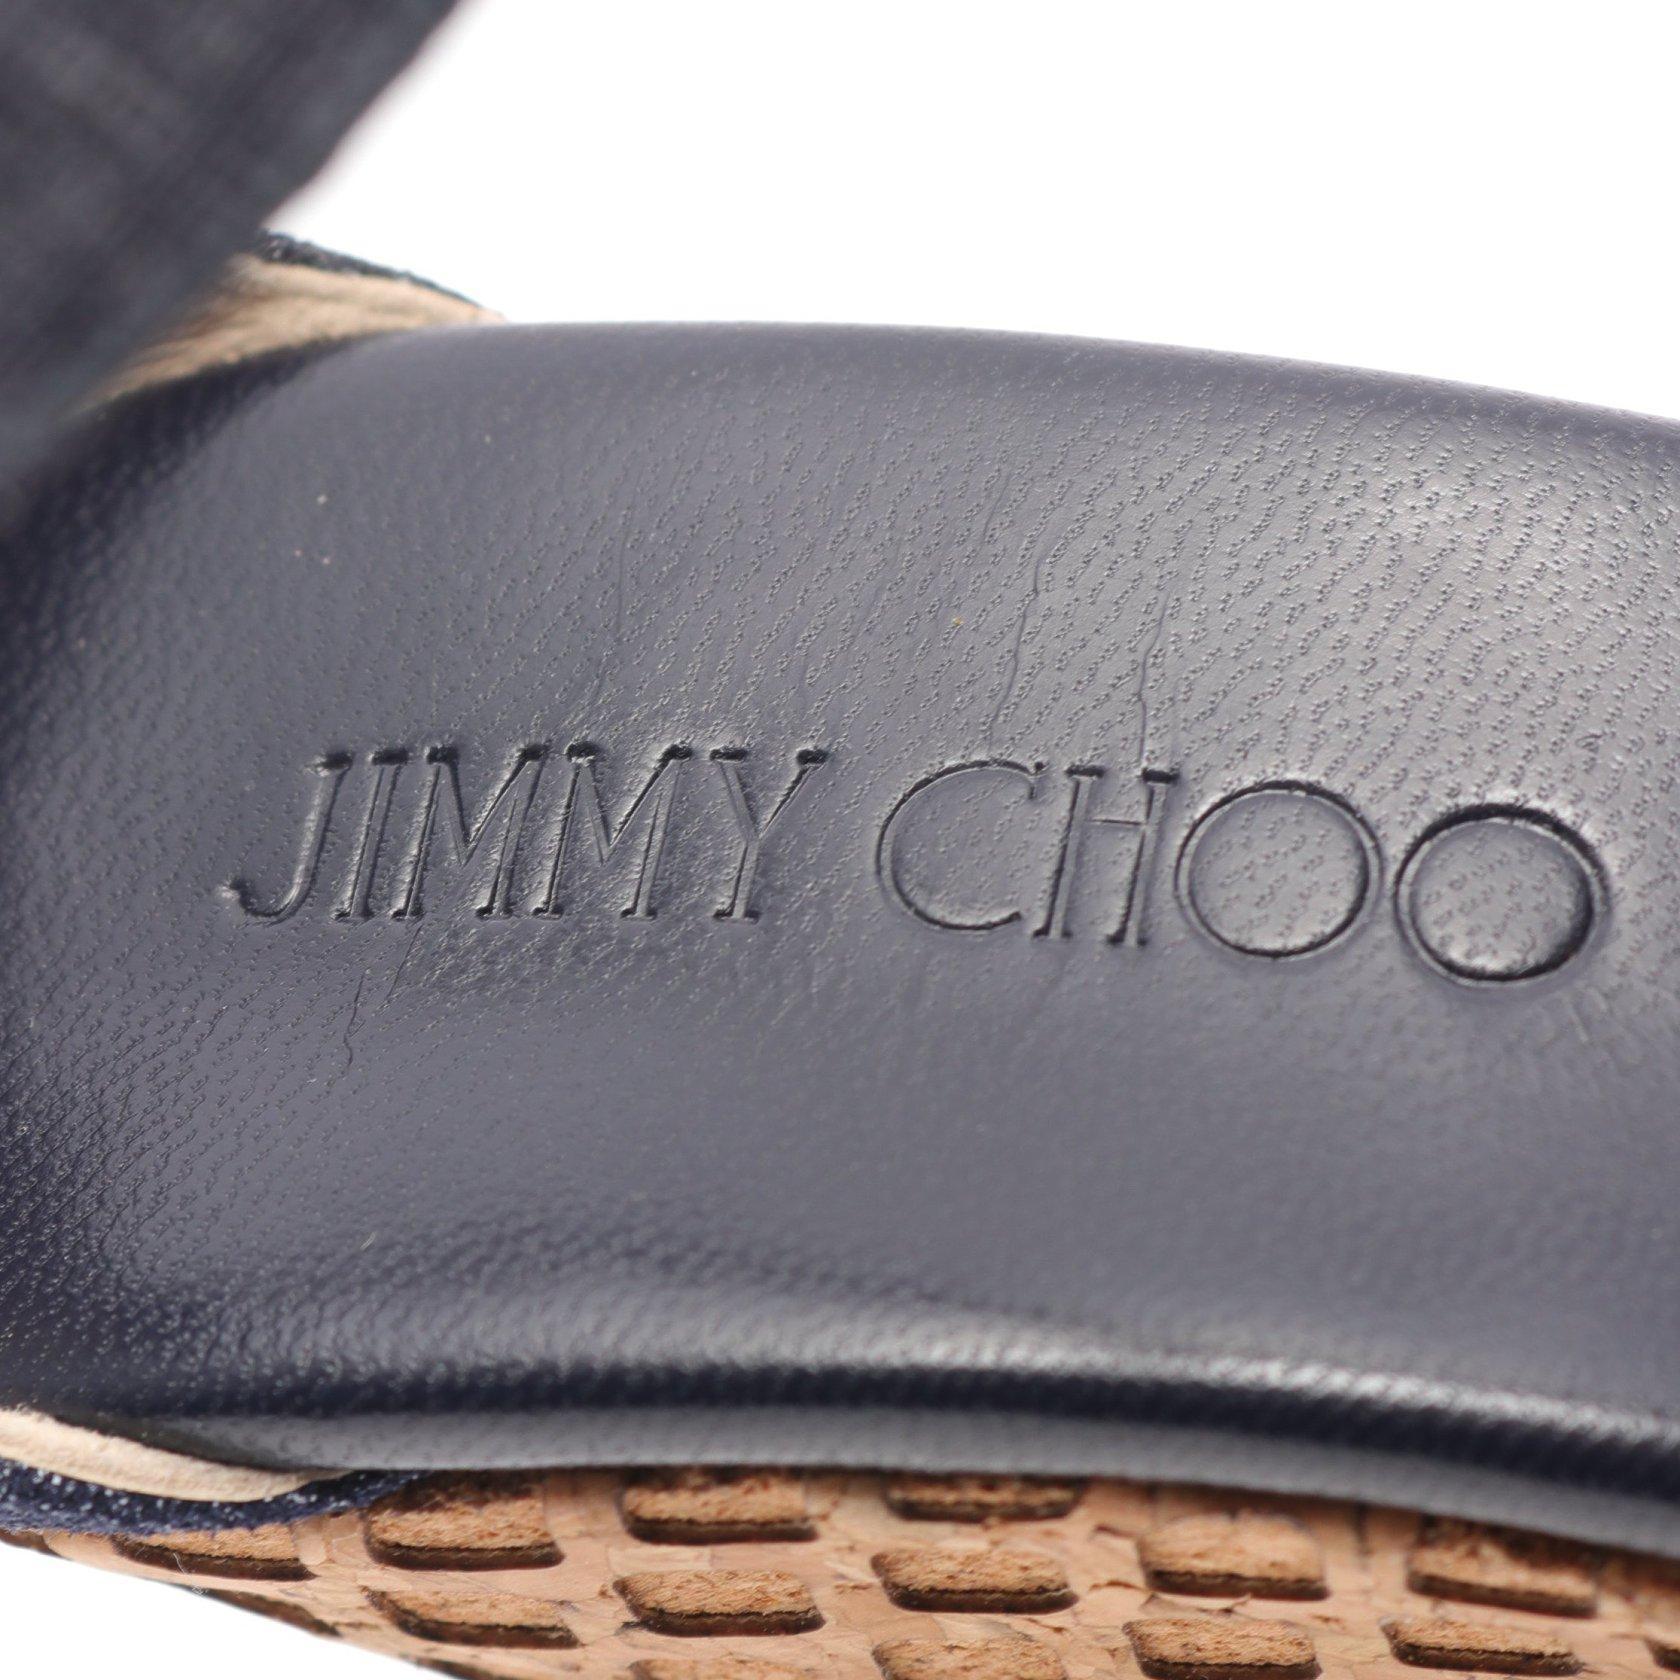 JIMMY CHOO・シューズ・PELA サンダル デニム レザー コルク ネイビー ベージュ ウェッジソール